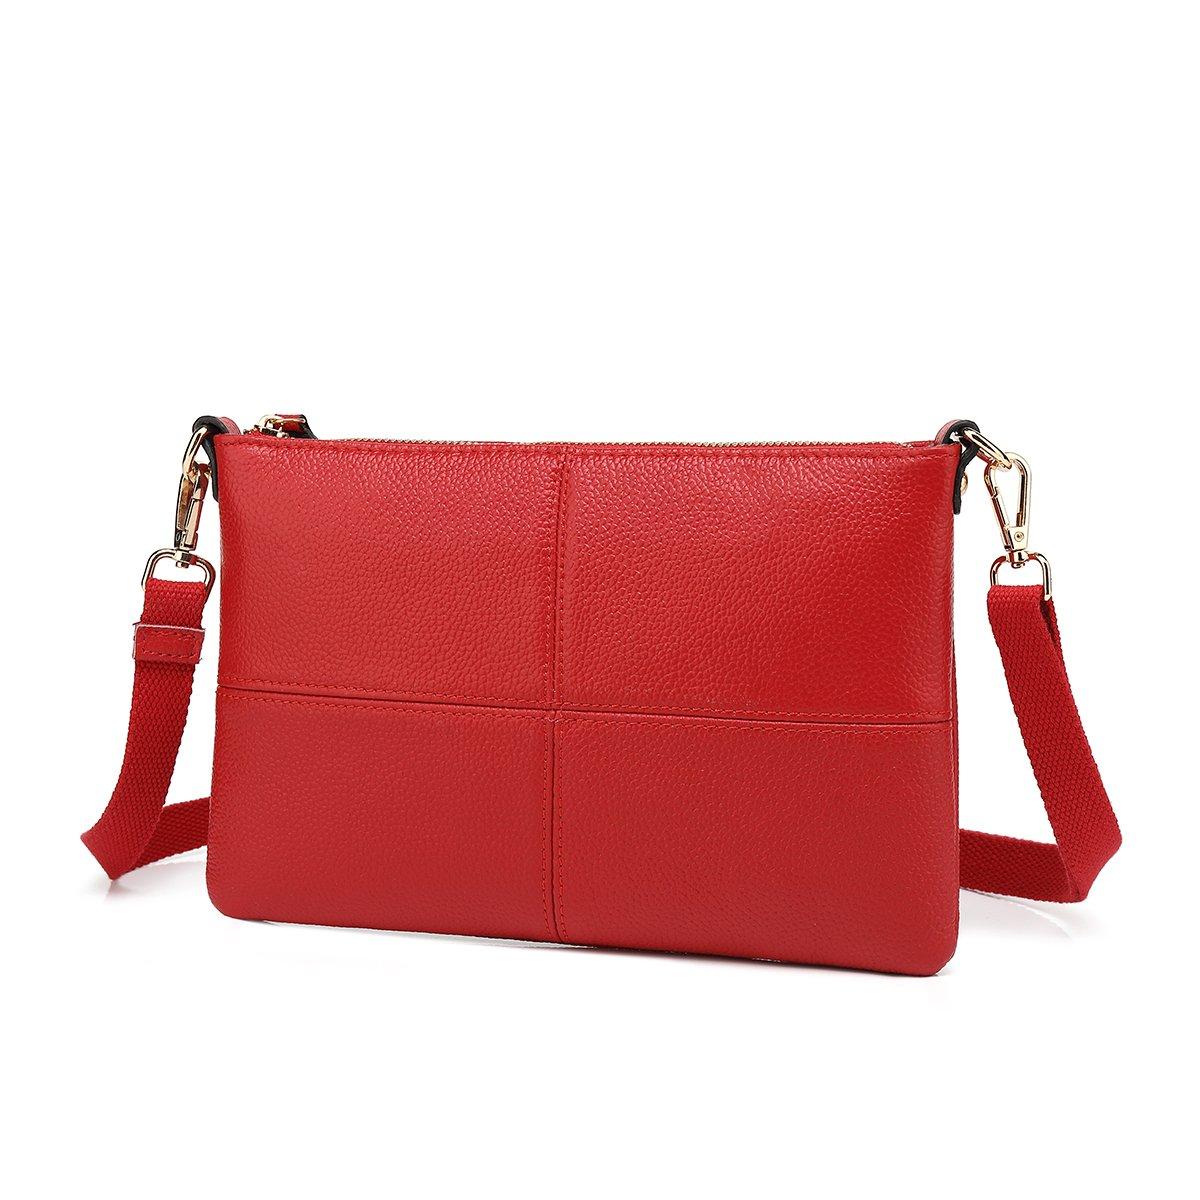 Women Leather Crossbody Bag,Clutch Purse Shoulder Bag for Travelling Red